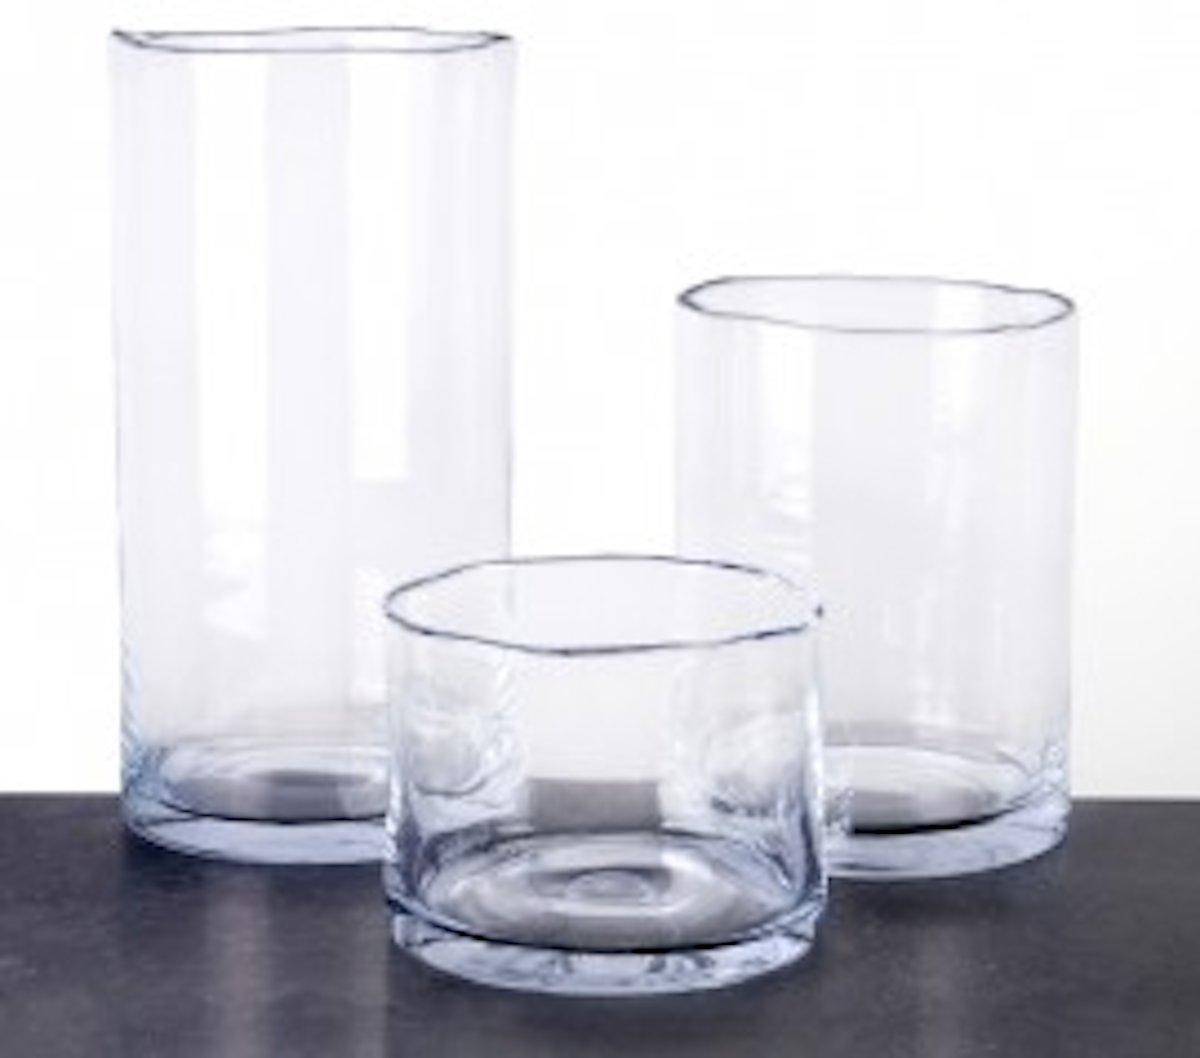 Maison Péderrey – Vaas – Cilinder vaas – Glas – Mond geblazen glas